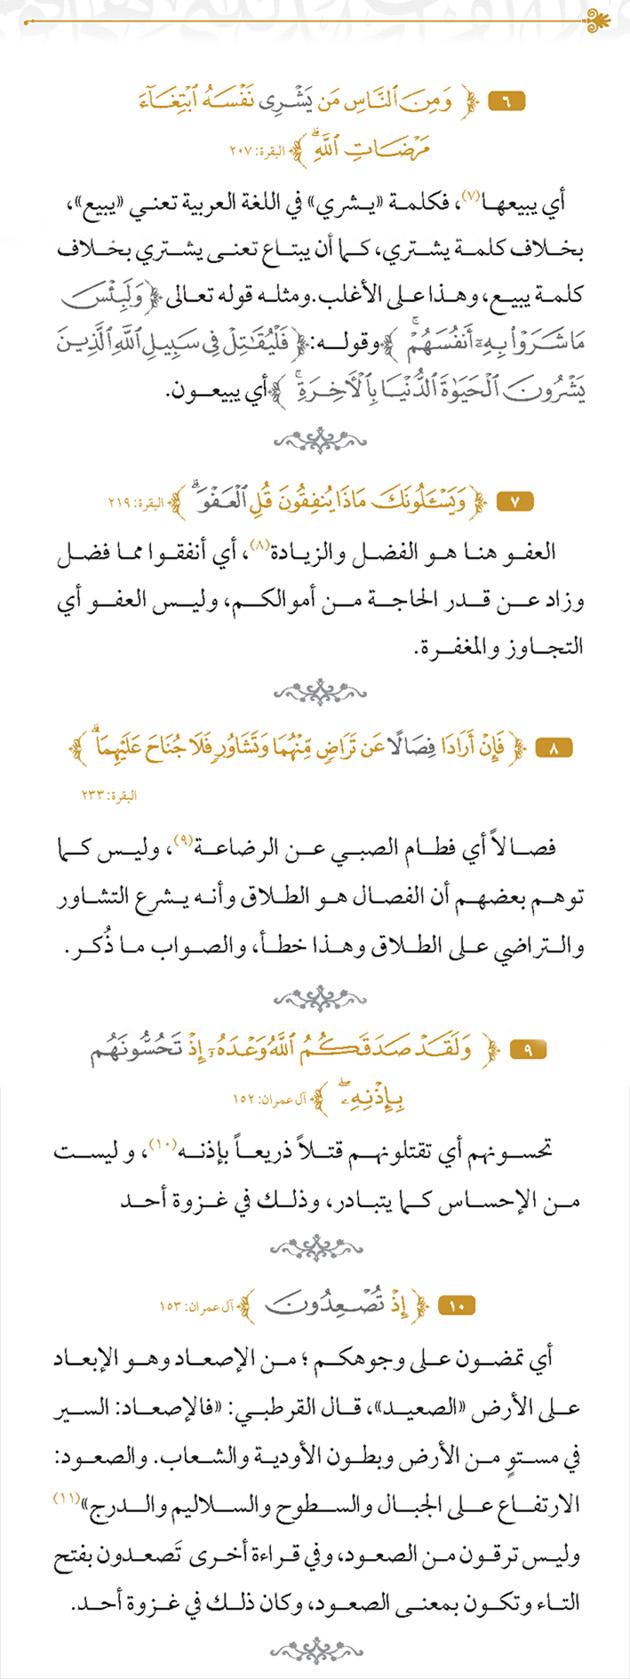 akhawat_islamway_1392671840__6-10.jpg